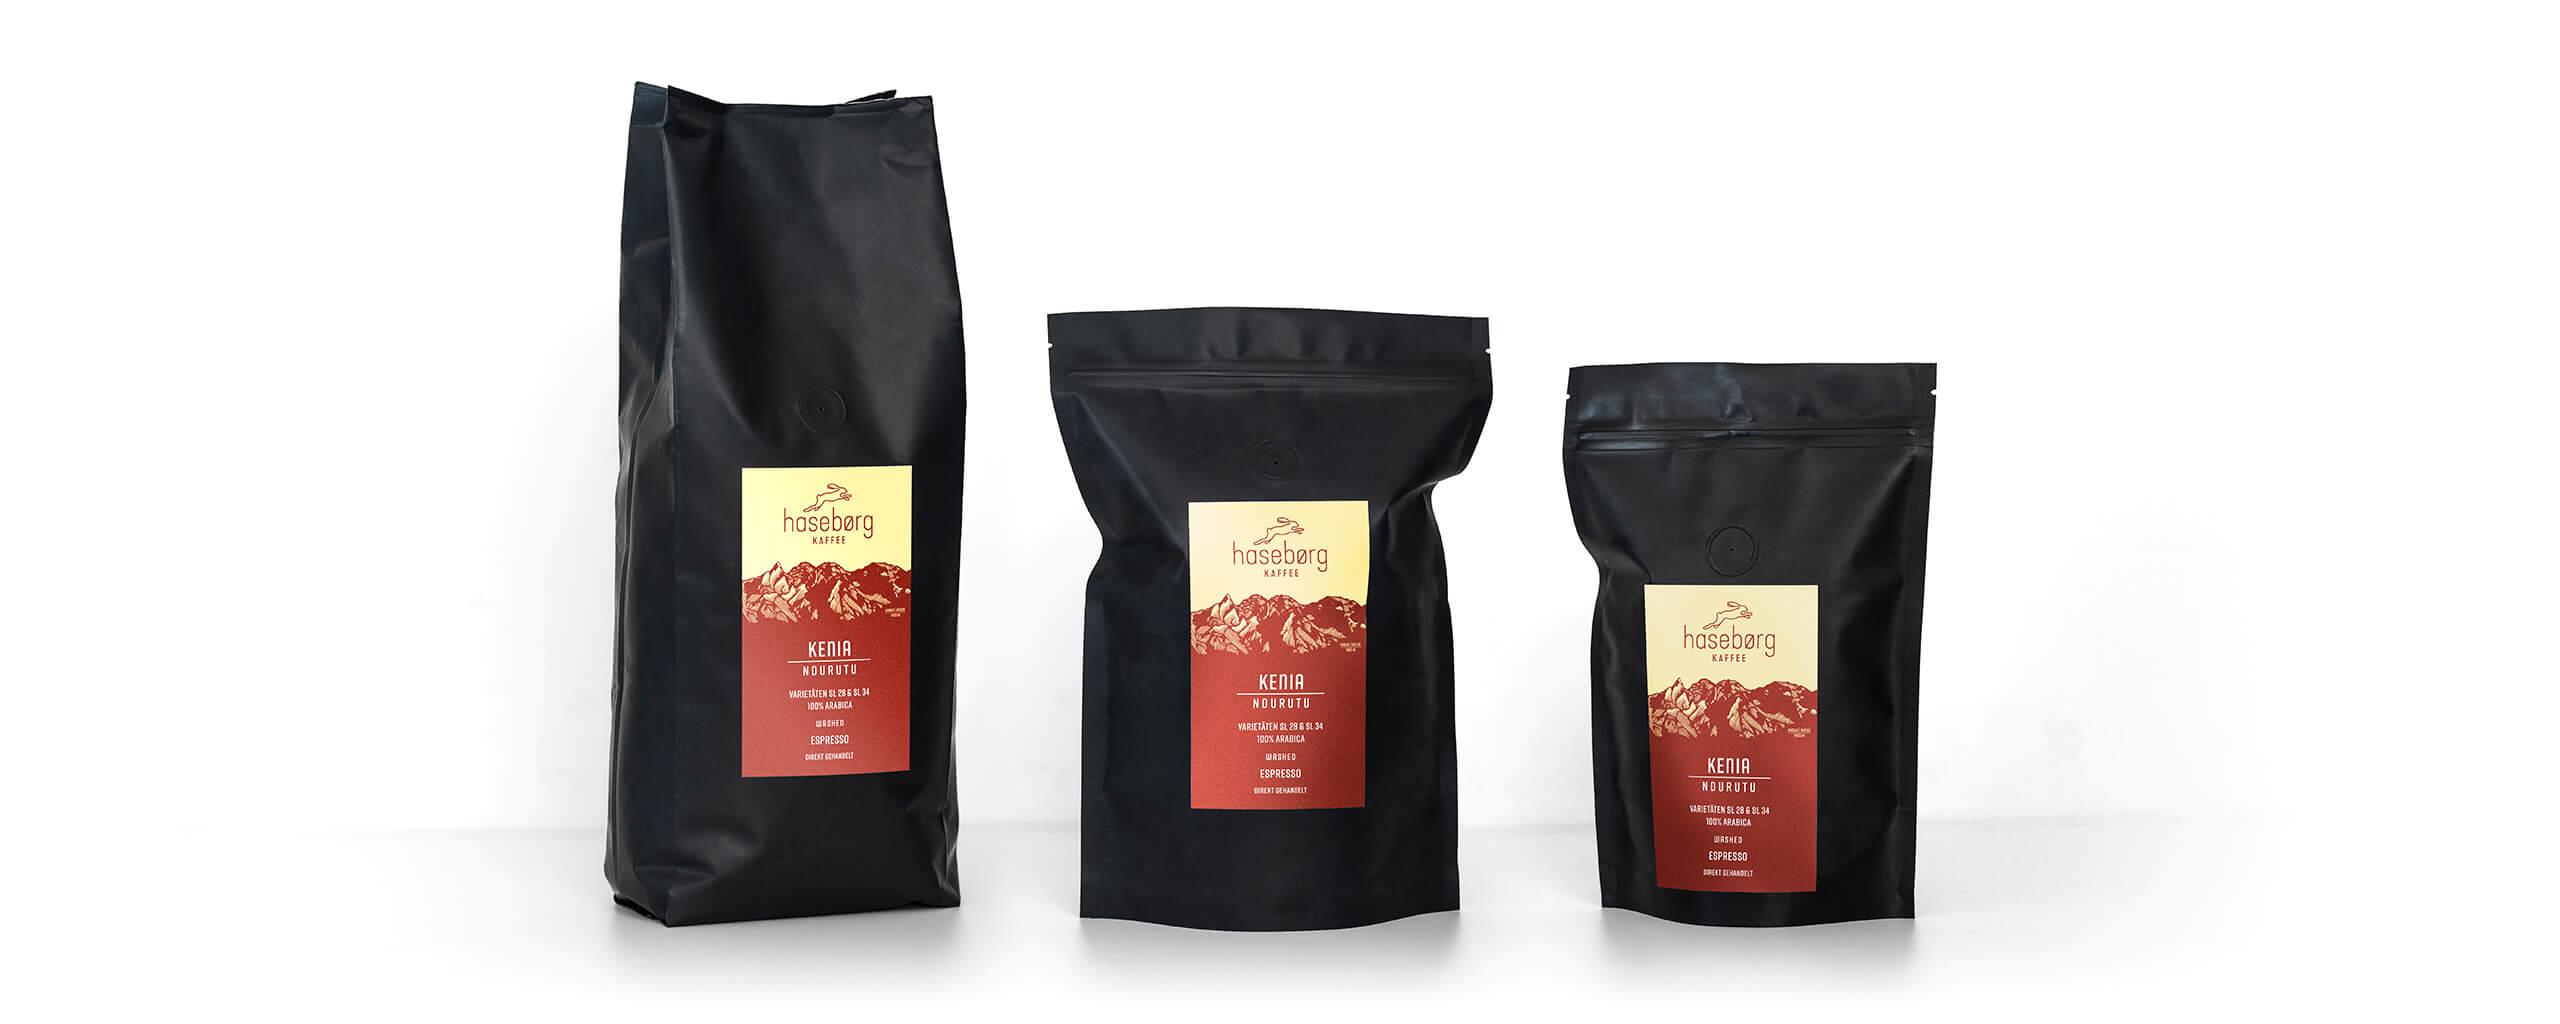 haseborg_kaffee-beutel_kenia-ndurutu-overview-tiny